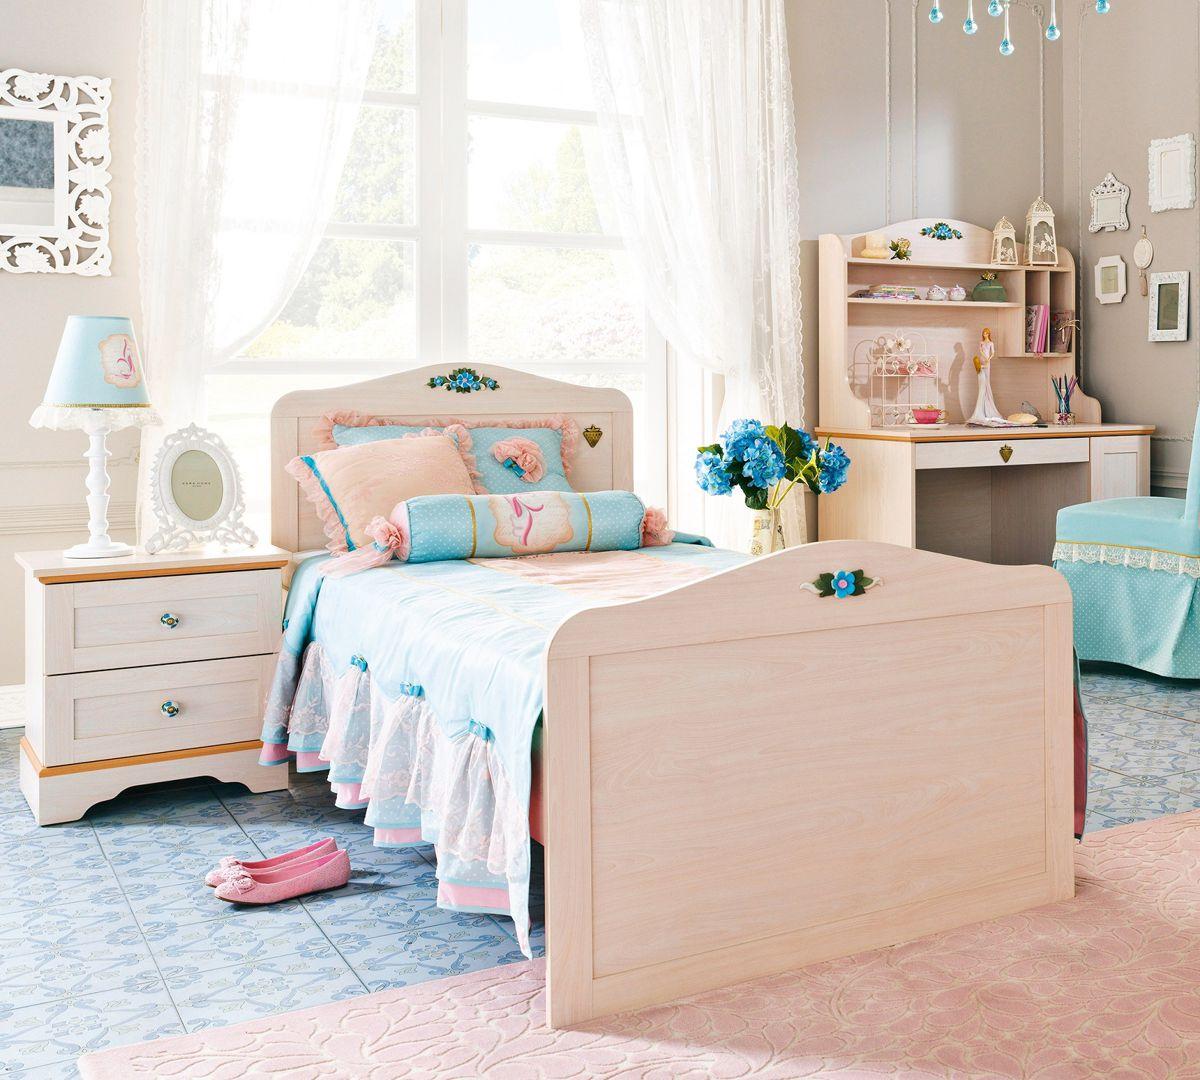 Full Size of Mädchen Mdchen Flora 90x190 Fr Online Bett Betten Wohnzimmer Kinderbett Mädchen